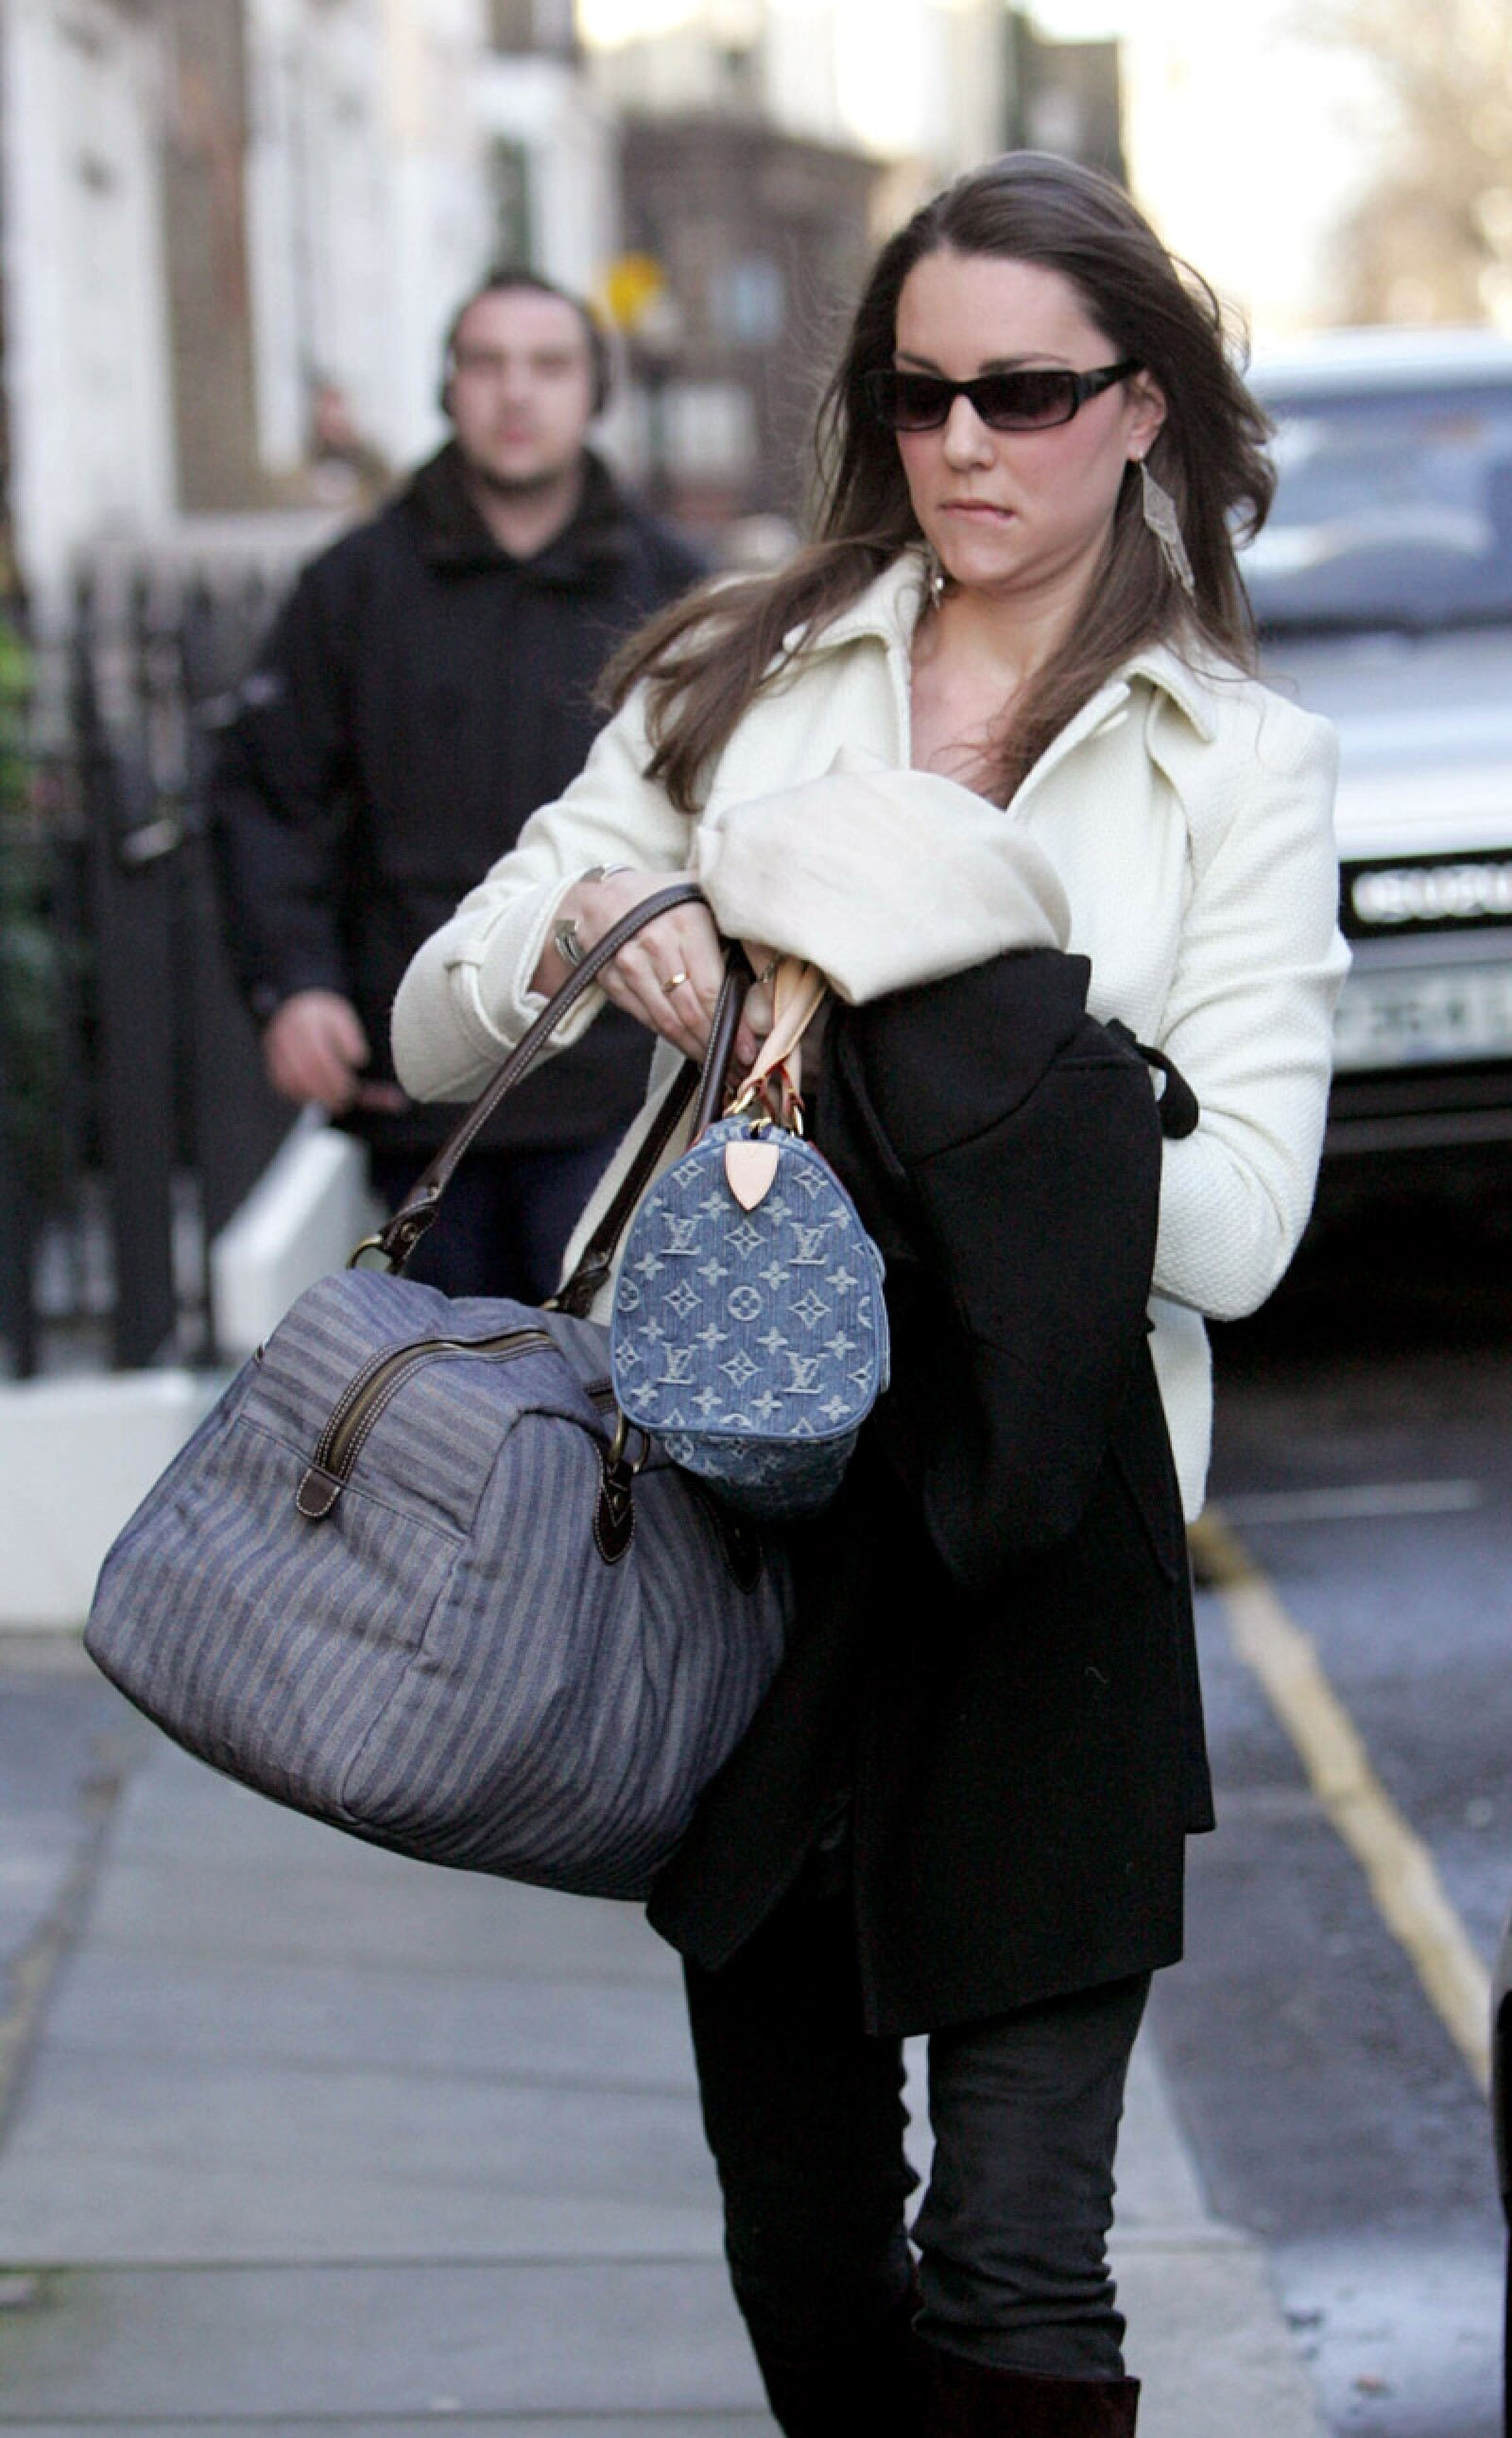 Kate Middleton leaving her Chelsea home in the morning, London, Britain - 01 Mar 2007